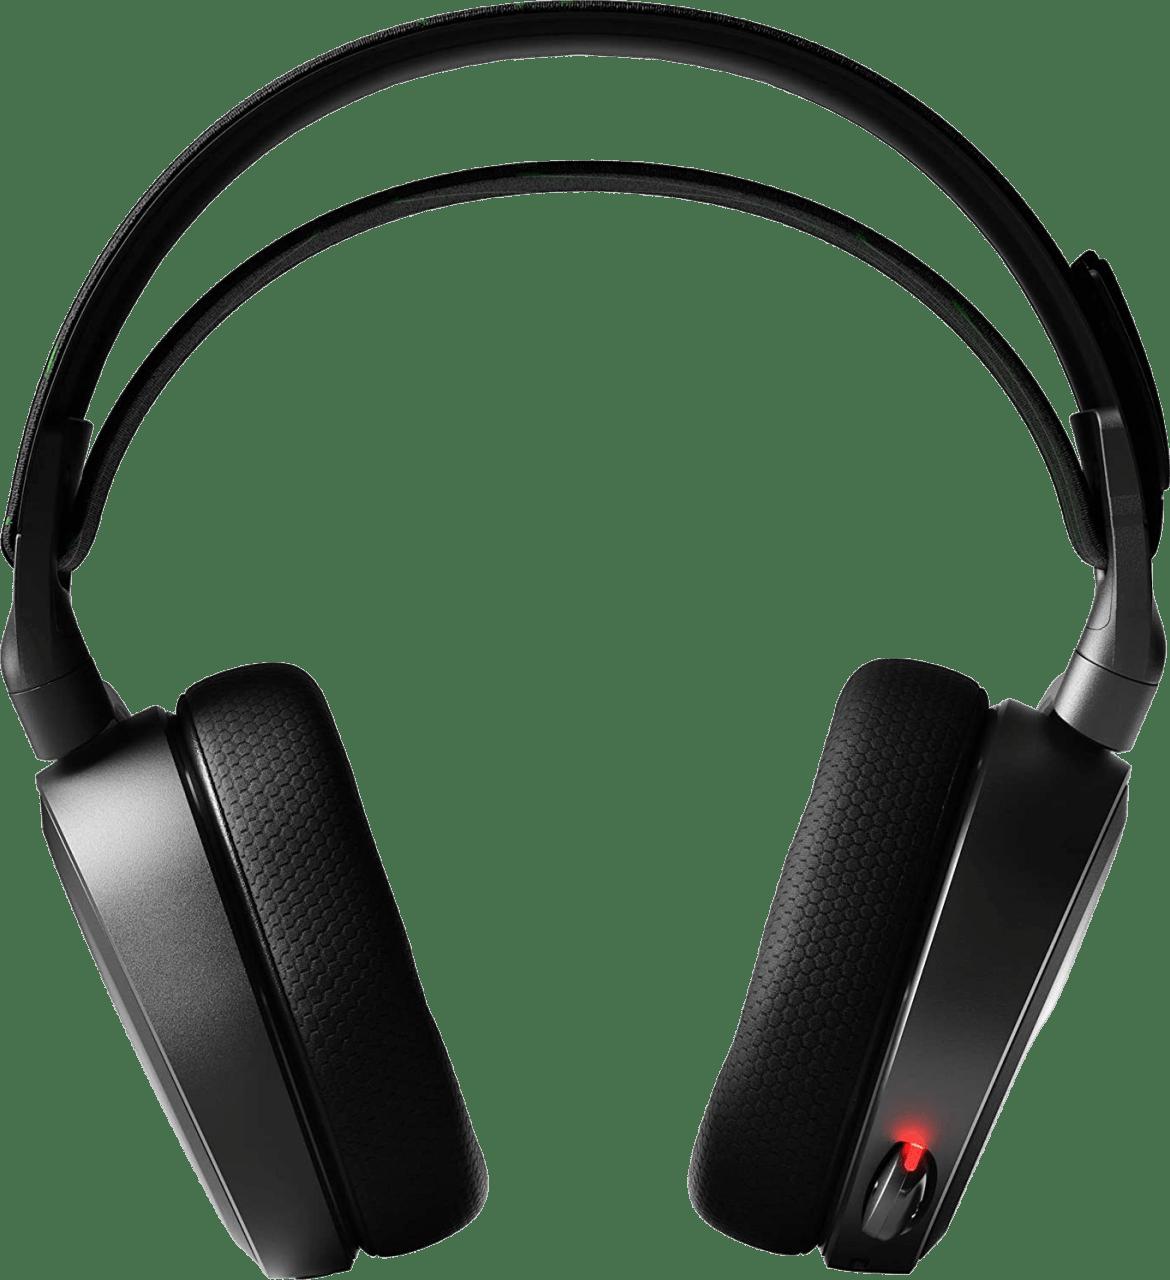 Schwarz Steelseries Arctis 9X Over-Ear-Gaming-Kopfhörer.4